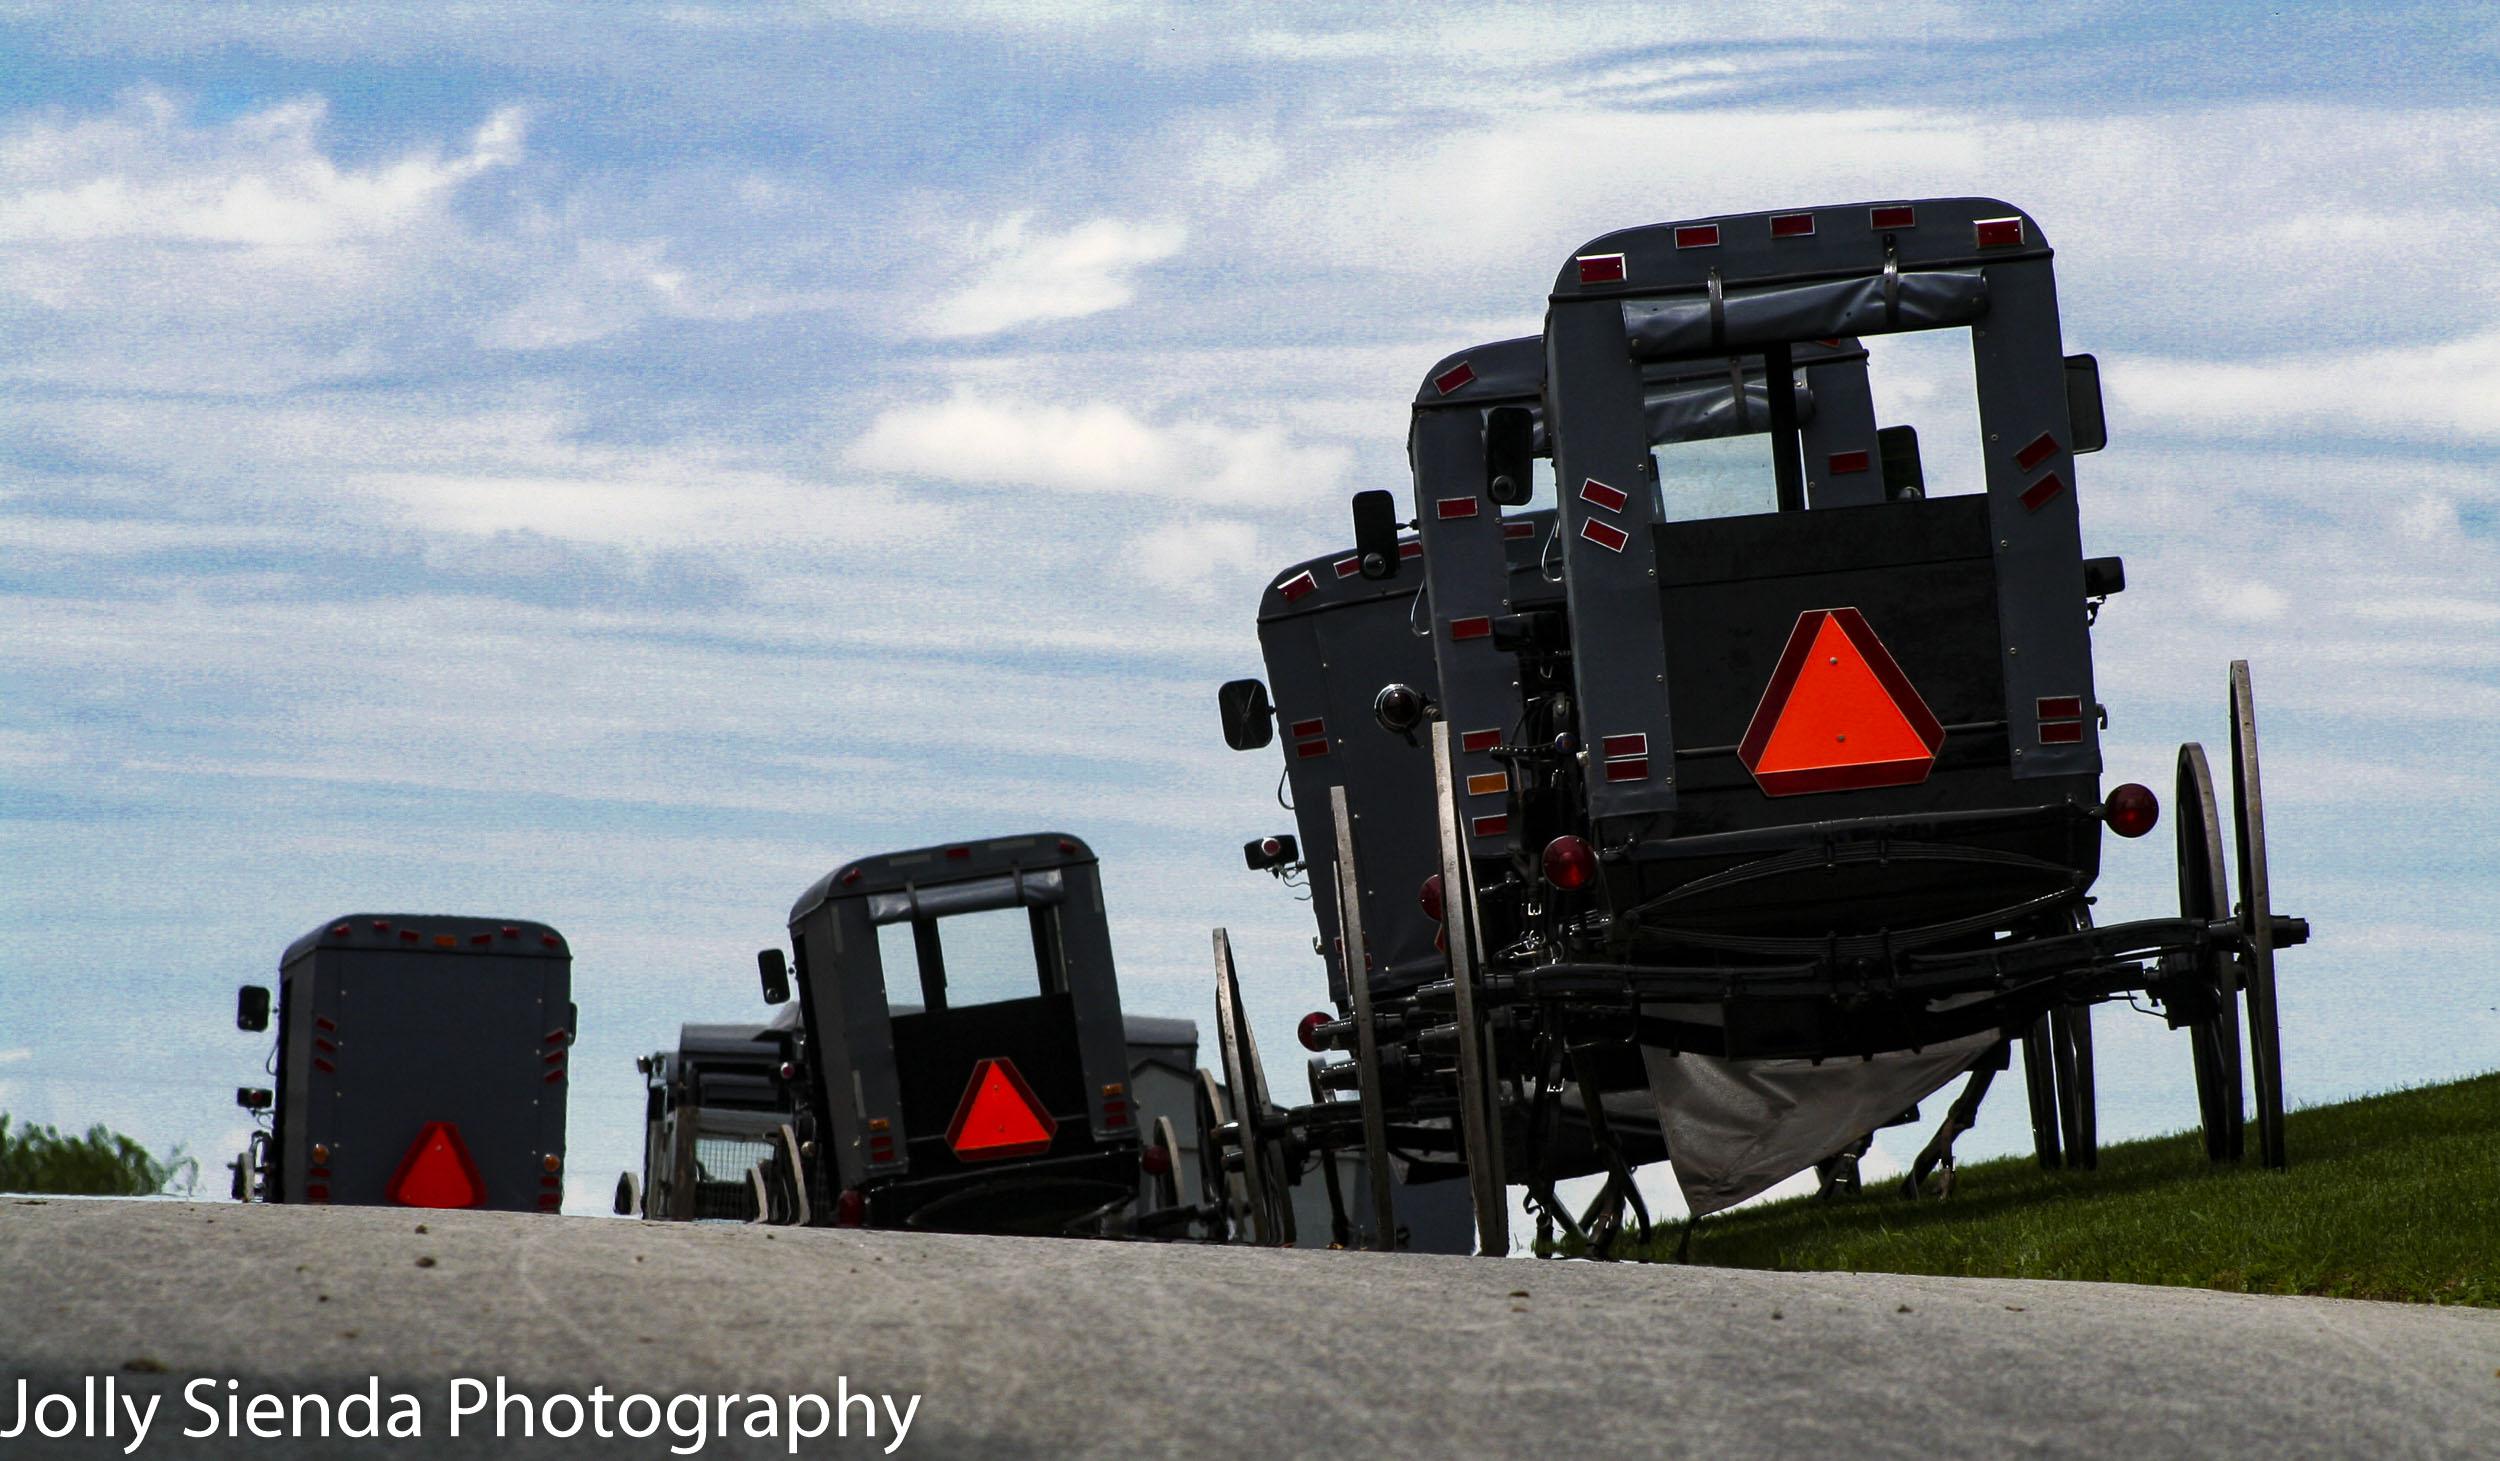 Parked Amish grey buggies